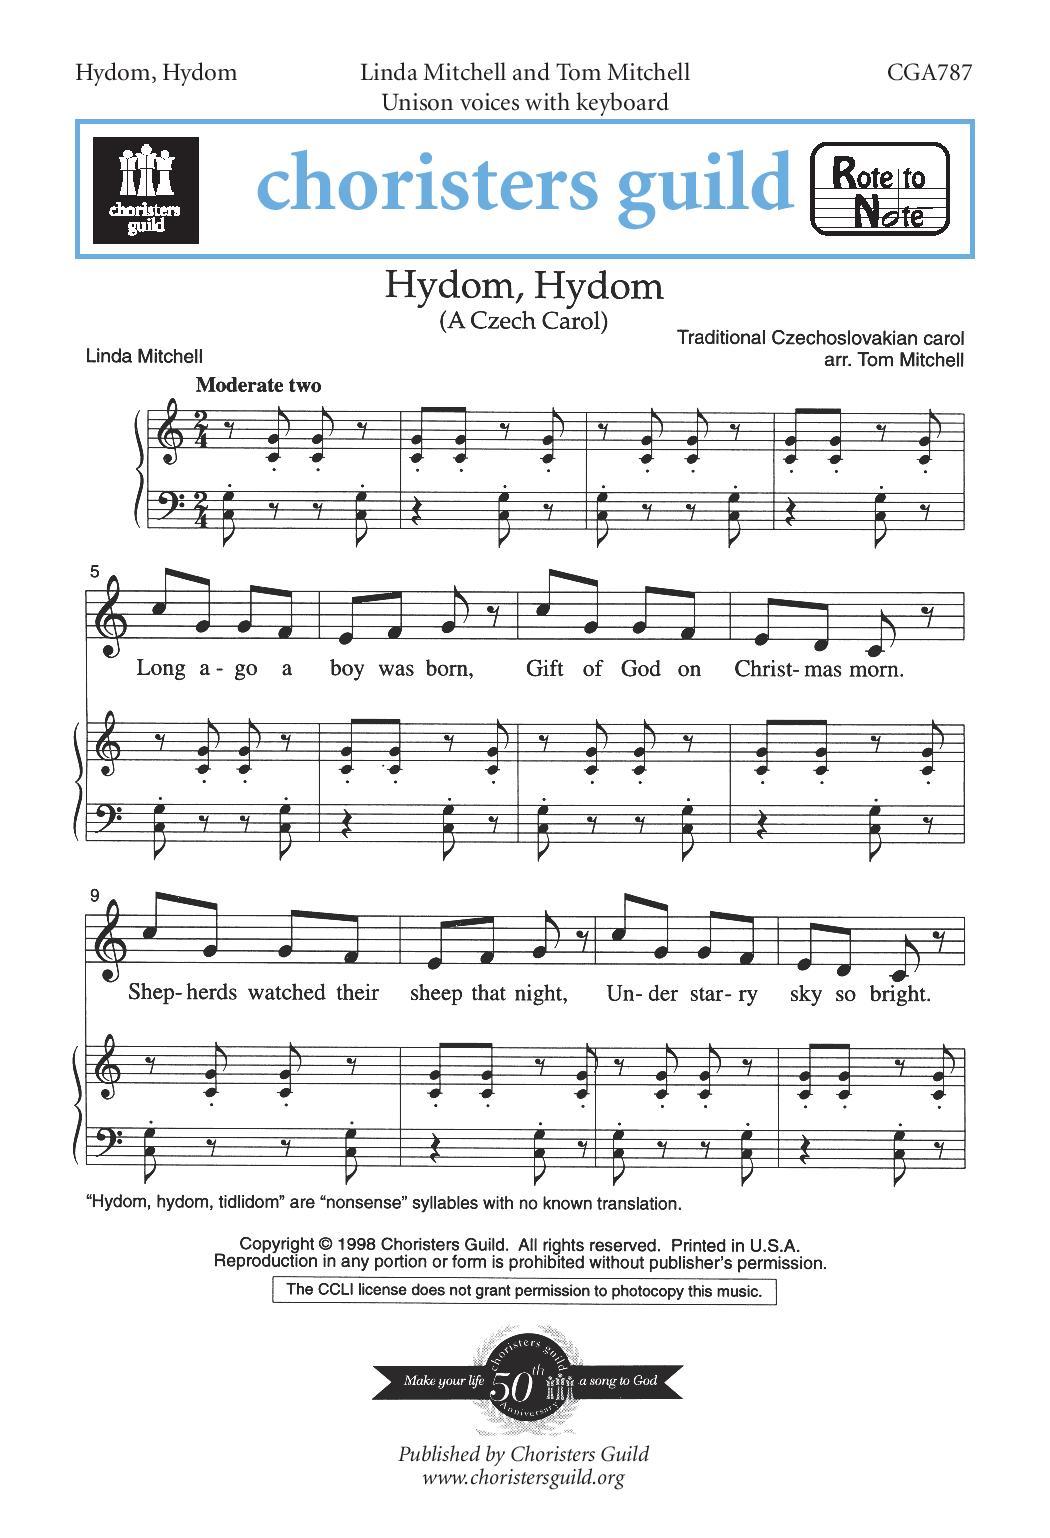 Hydom, Hydom A Czech Carol